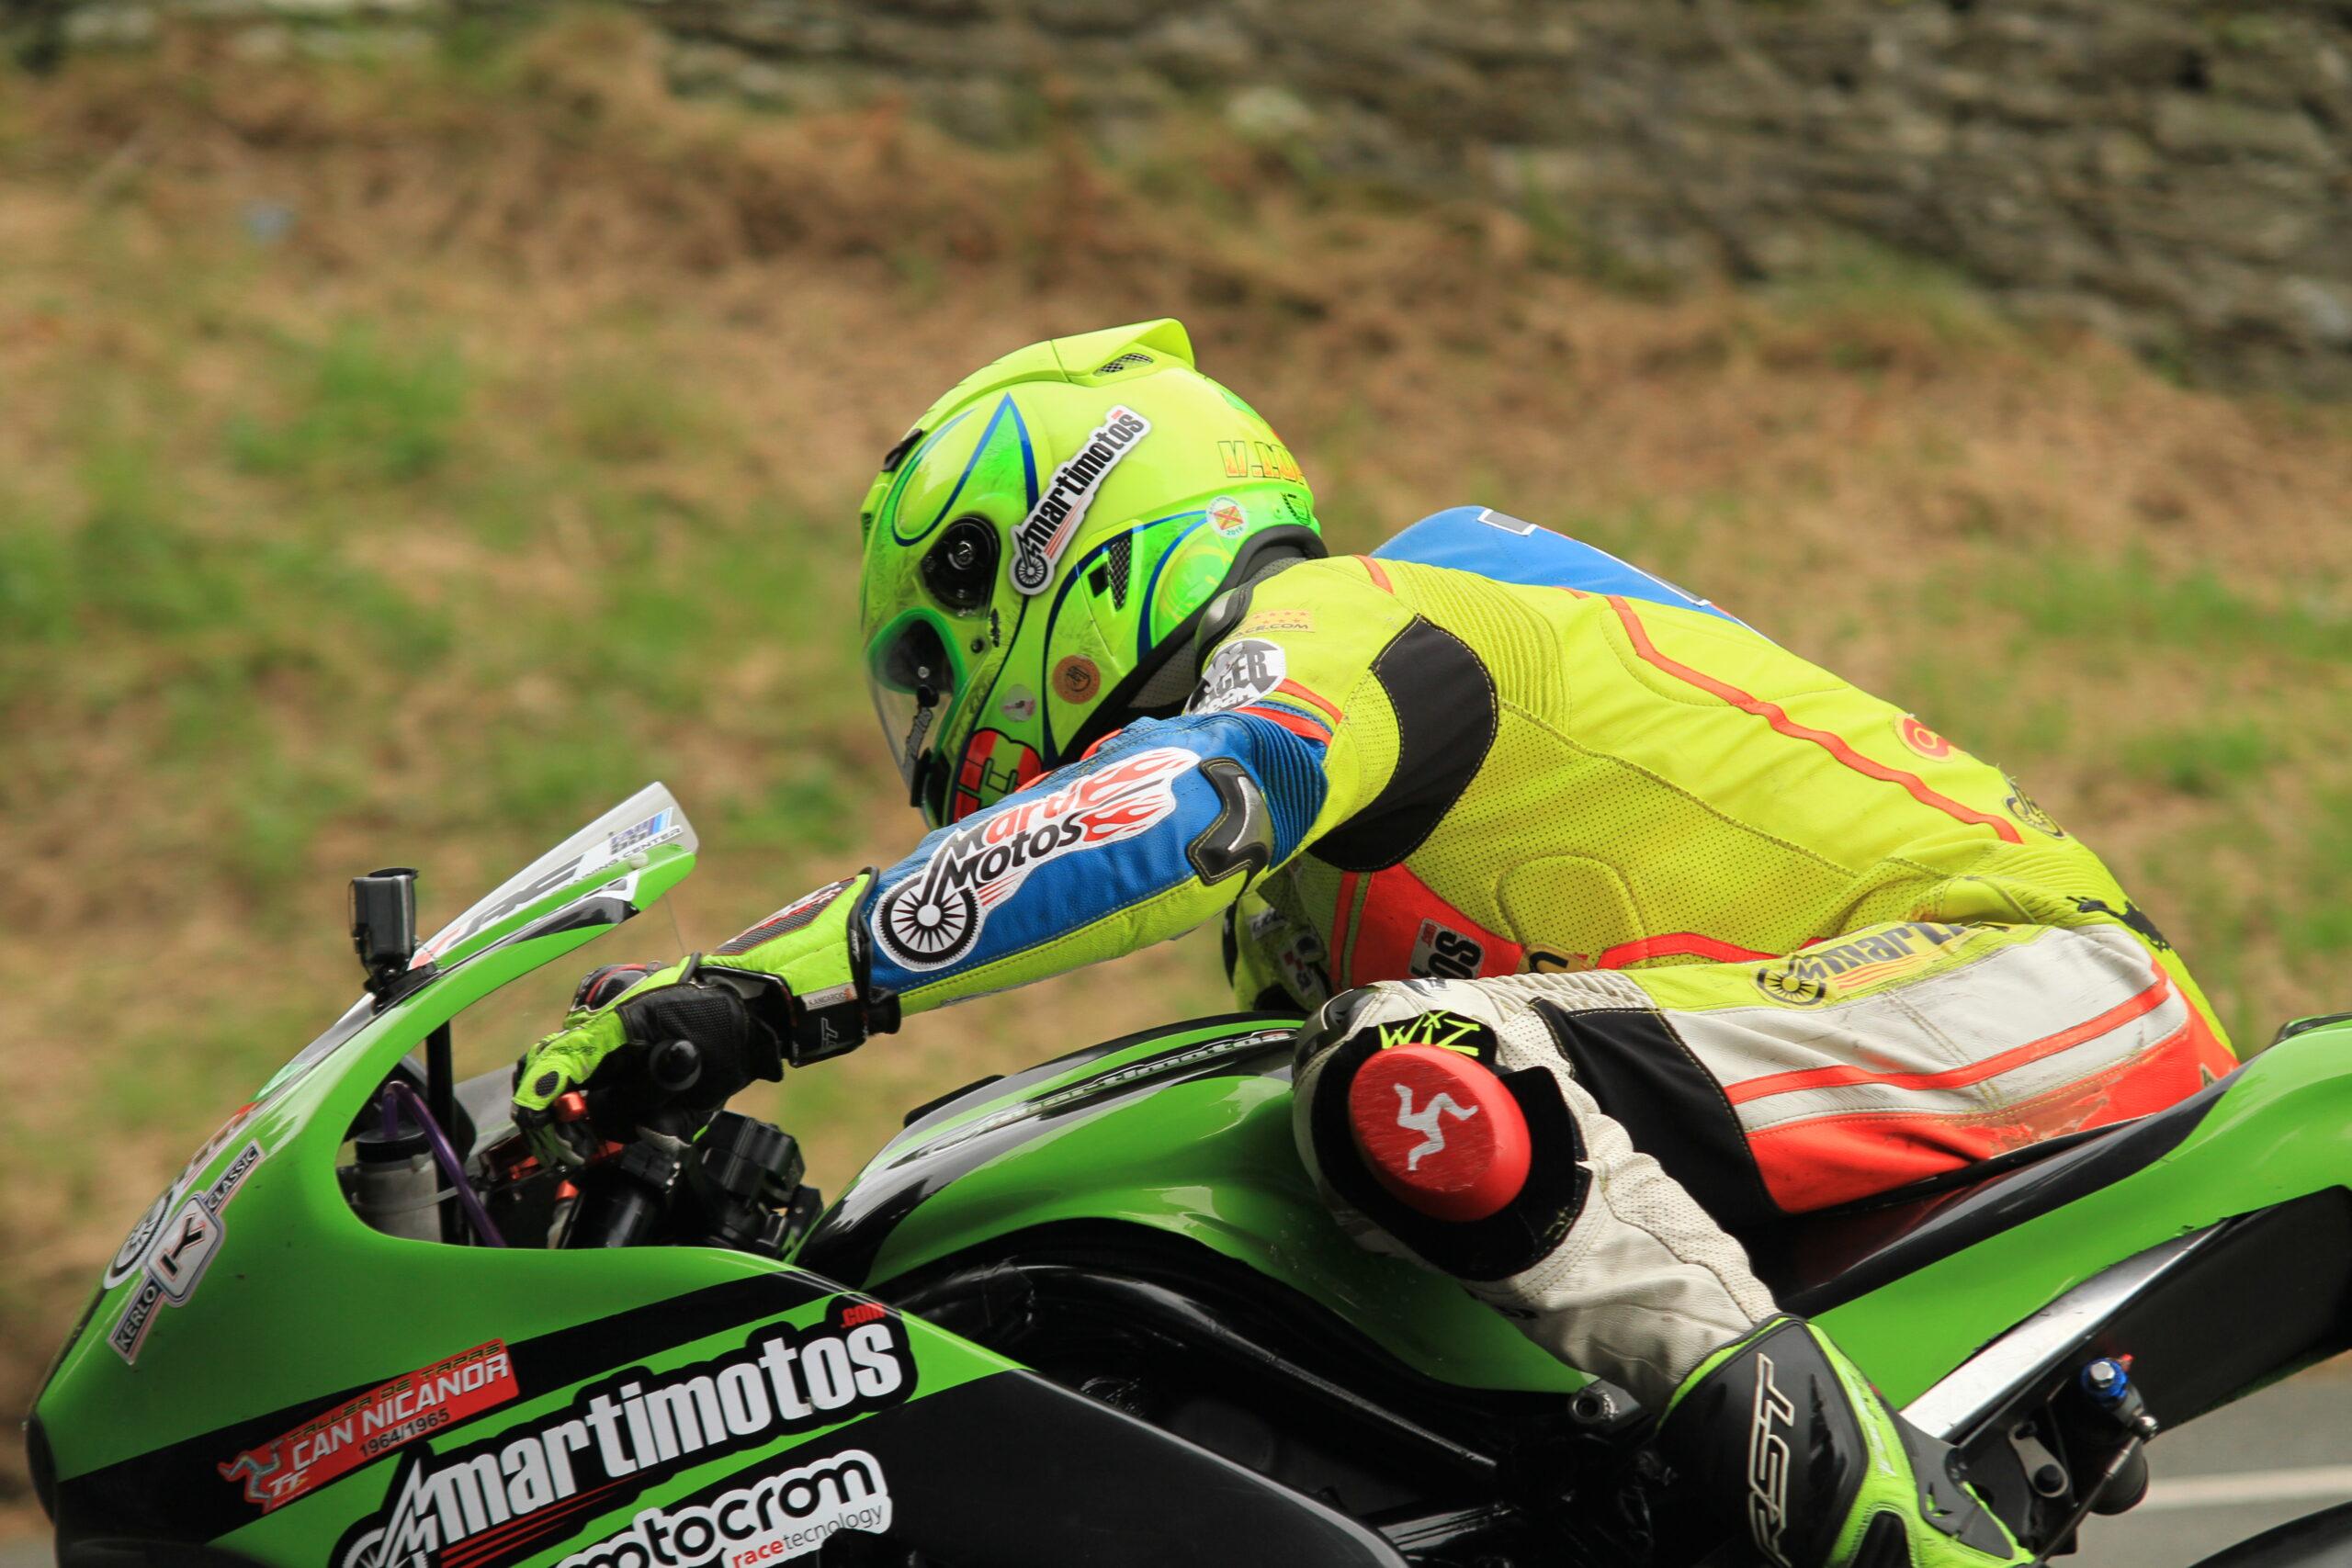 Manx Grand Prix 2016 – Spanish Stars Enjoy Positive Race Week